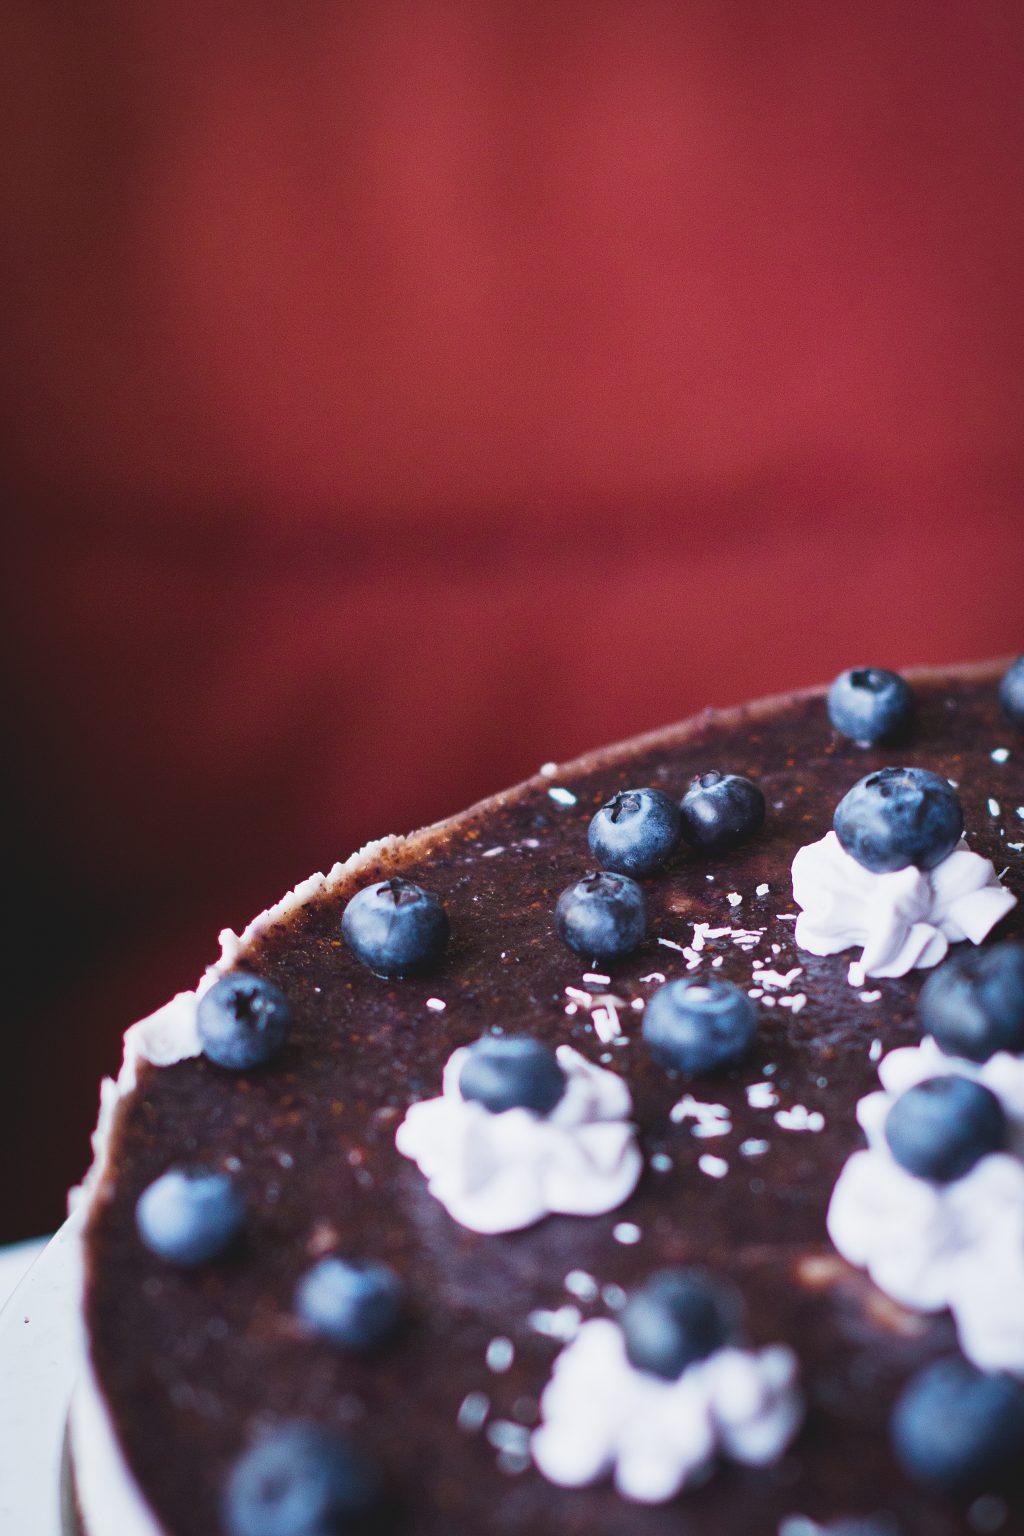 Cold cheesecake 2 - free stock photo